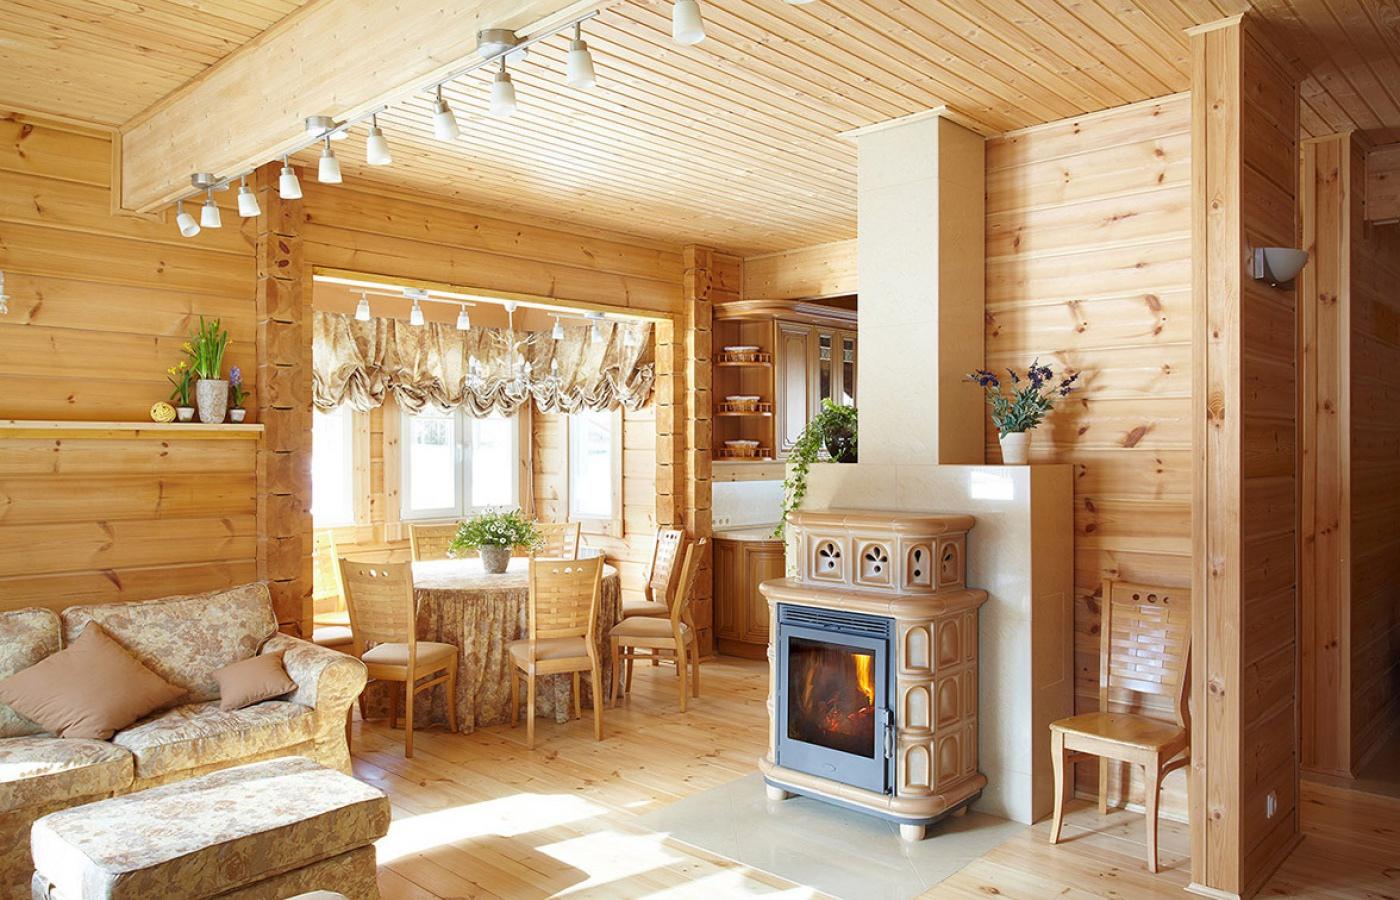 Интерьеры деревянных коттеджей - Интерьеры деревянных домов, фото Фото деревянных